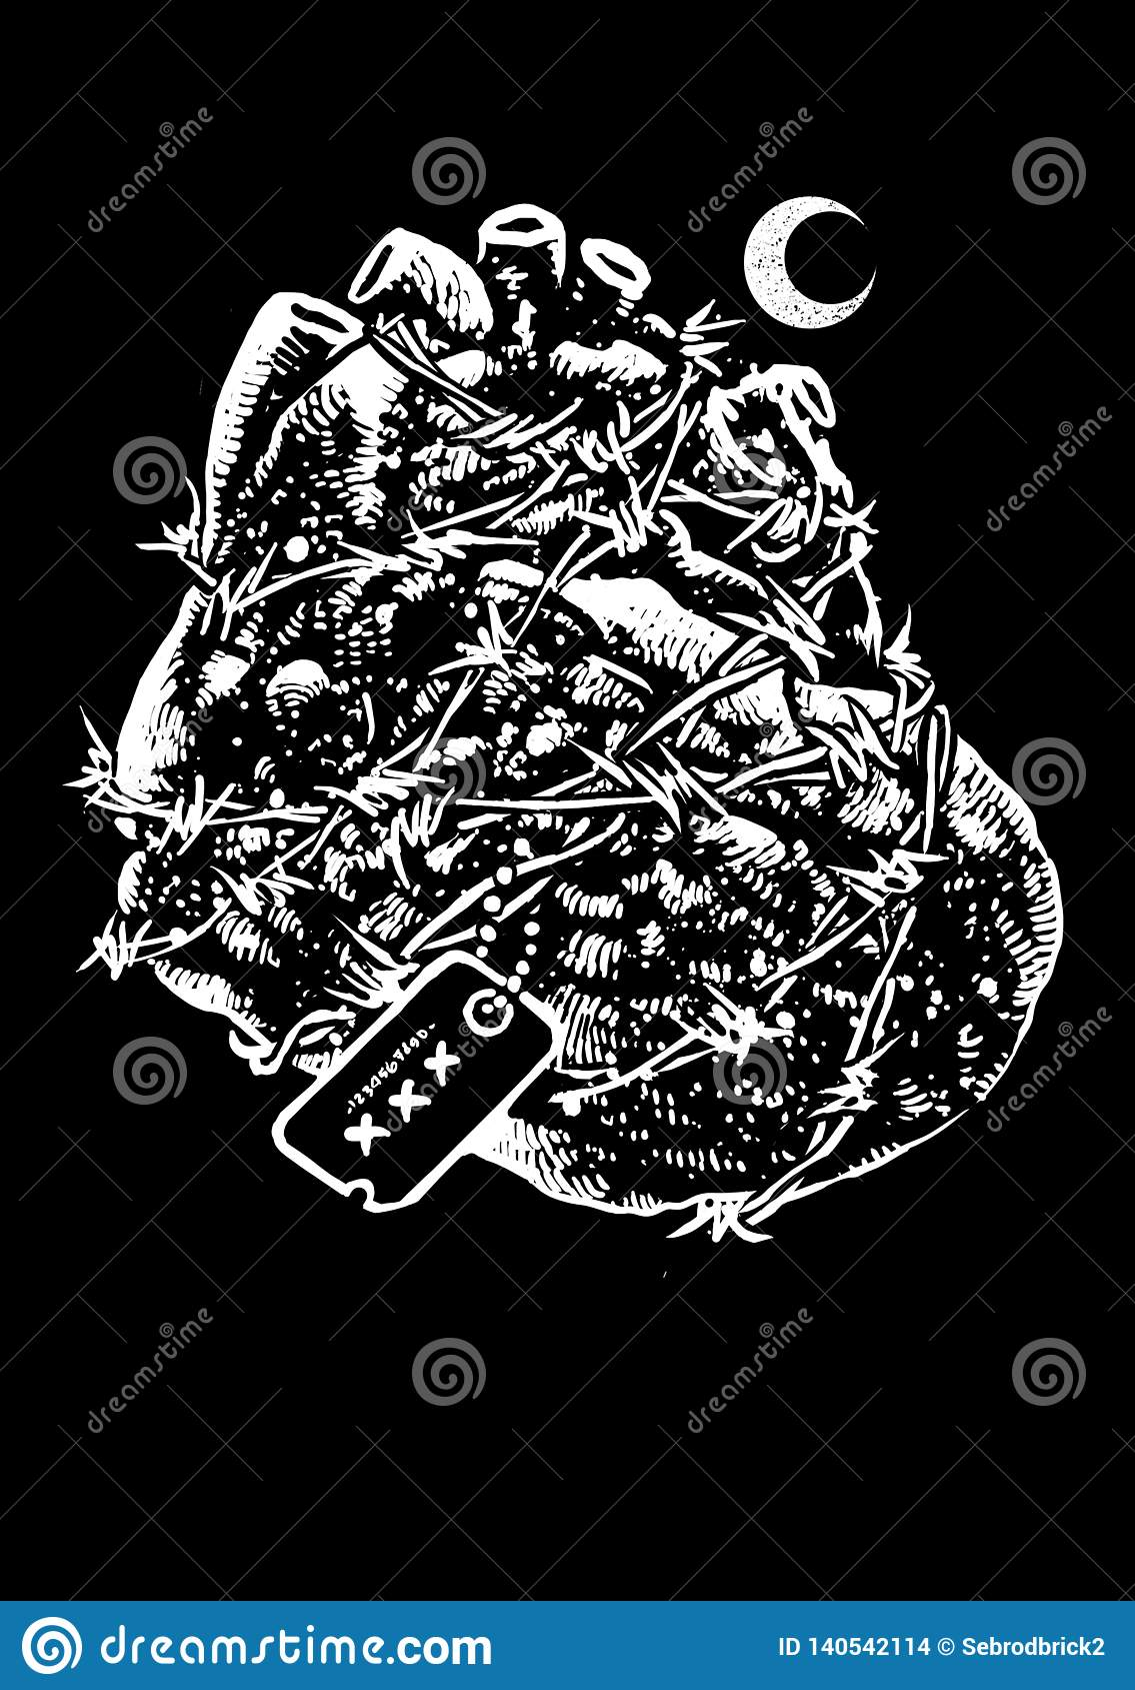 Harthelden Vectorart illustration